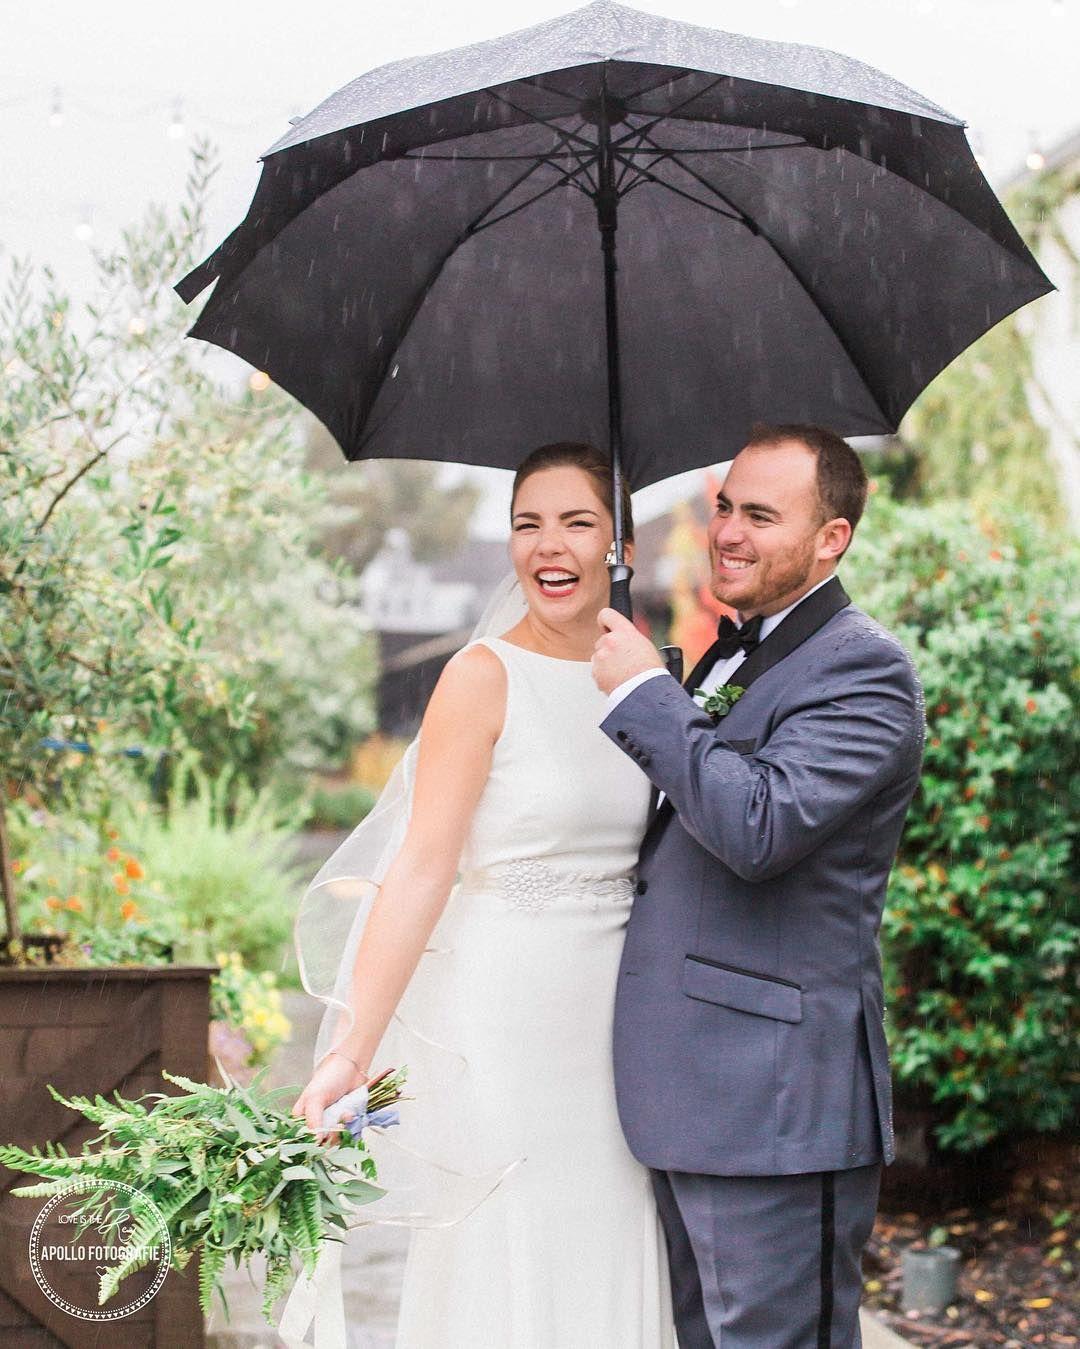 All smiles during the rain! #rain #rainydays  #sanfranciscoweddingphotographer #love #art  #sanfranciscoweddingphotography #weddingphotography #beauty  #weddingphotographers #style #life  #like #bayareaweddingphotographers #weddings #bayareaweddings  #instagood #cute  #apollofotografie #loveisthekey #californiaweddings #follow #photooftheday  #bayareaweddings #instadaily #happy #beautiful #trending  #picoftheday # #stylemepretty #smpweddings